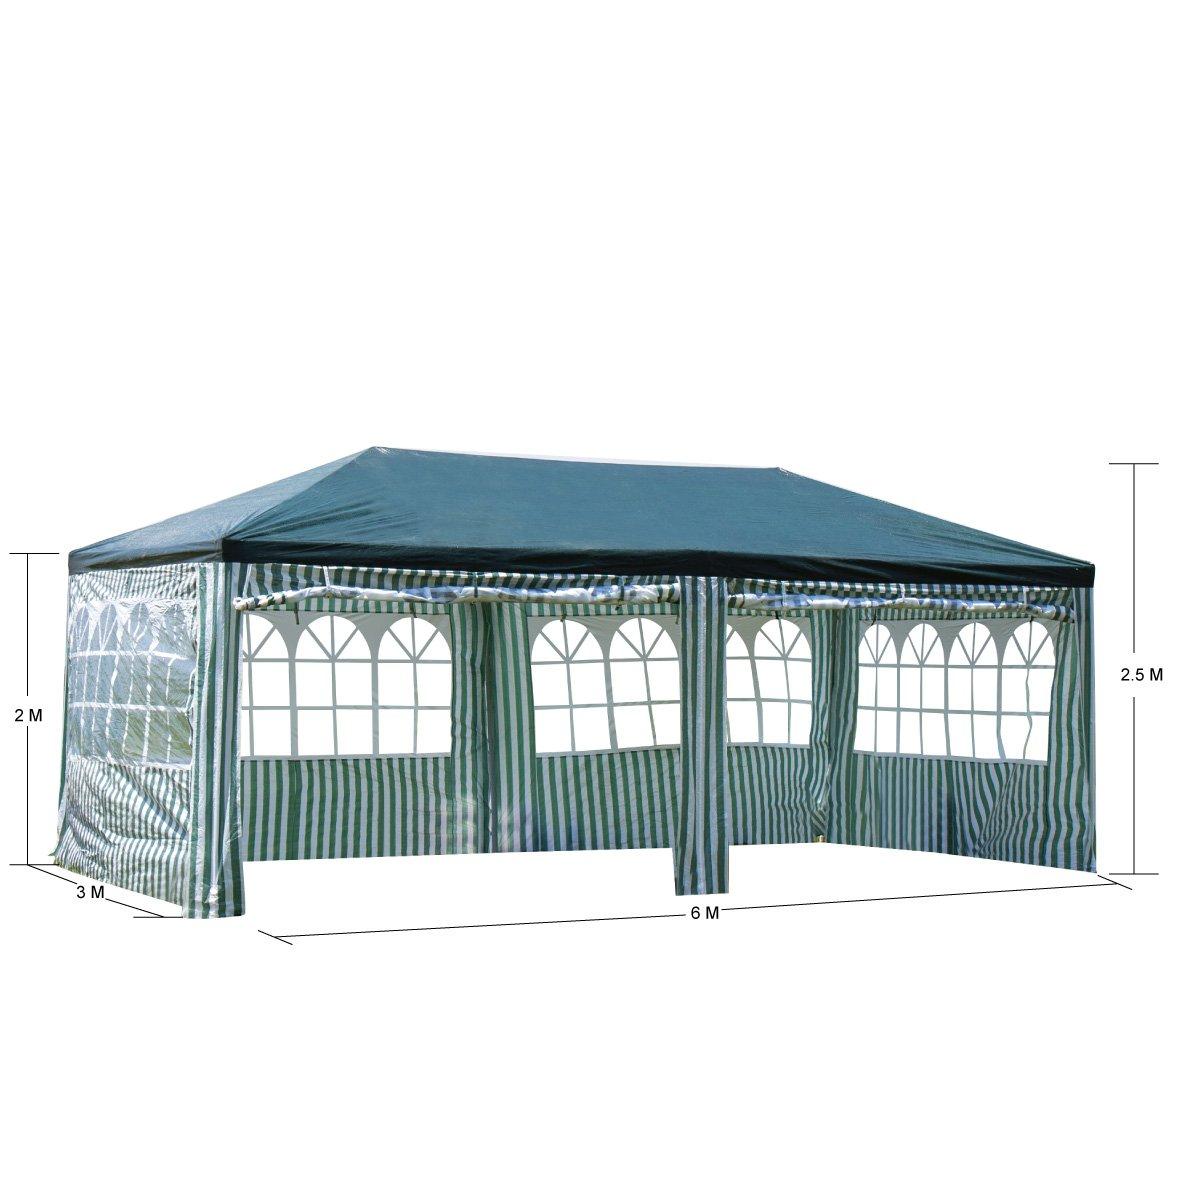 Gazebo 2 5 X 3.Xh Gardenlife Waterproof 3 X 6m Pe Gazebo Marquee Awning Party Tent Canopy Pe Power Coated Steel Frame Blue Garden Outdoors Ac Garden Furniture Accessories